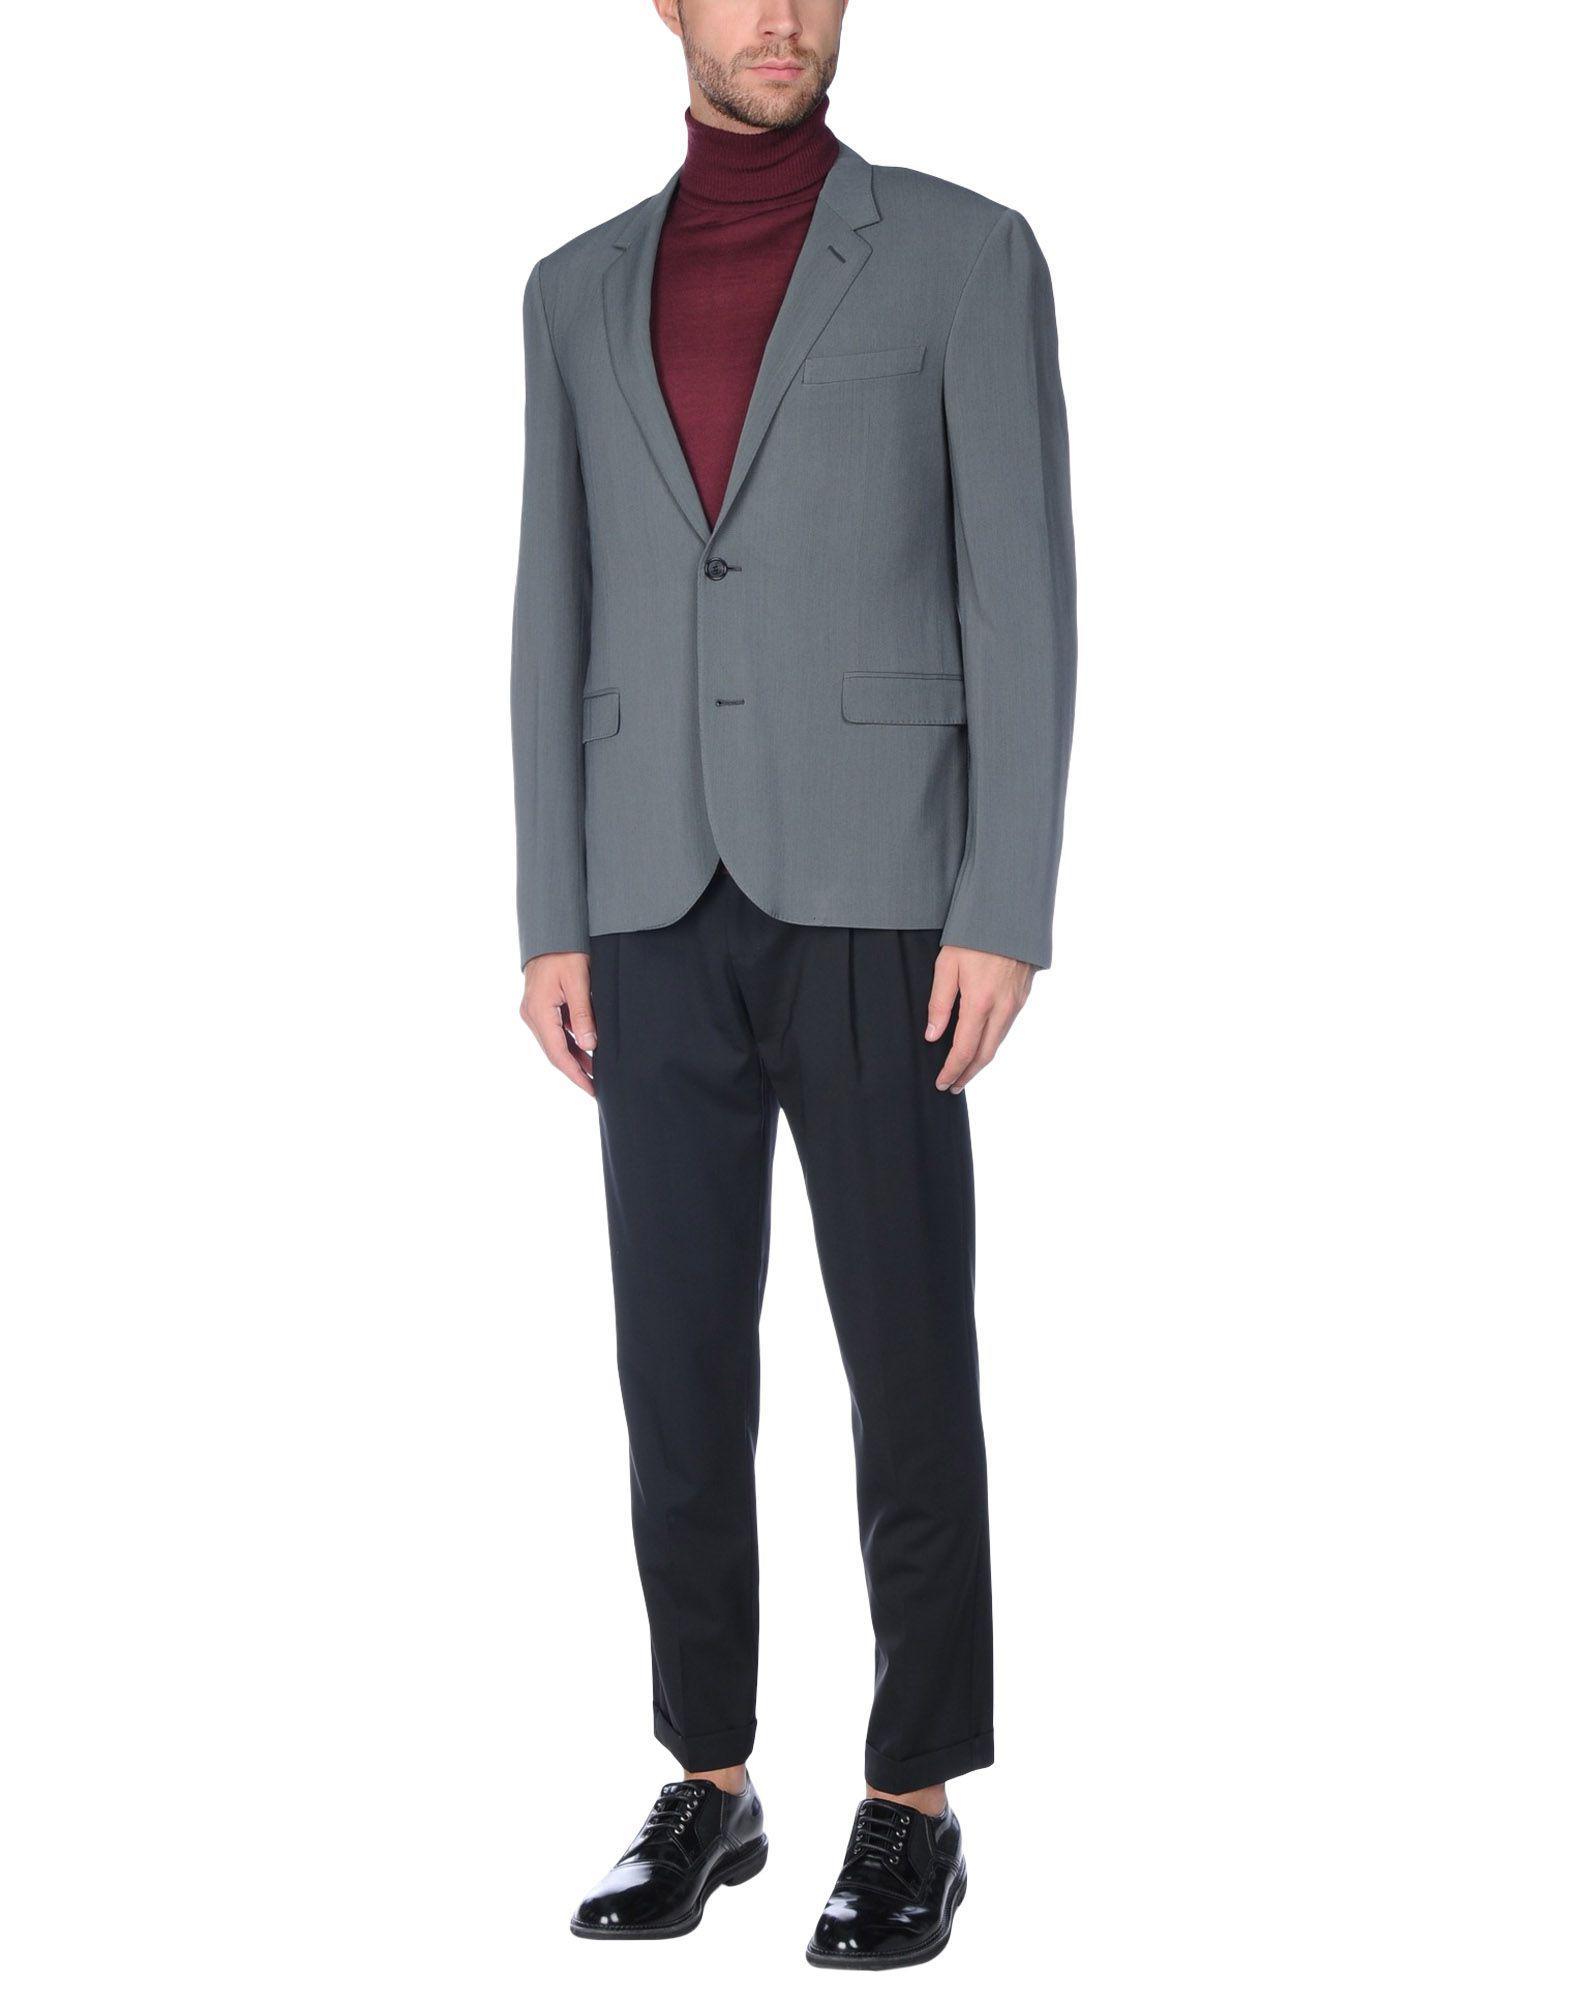 Lanvin Synthetic Blazer in Grey (Grey) for Men